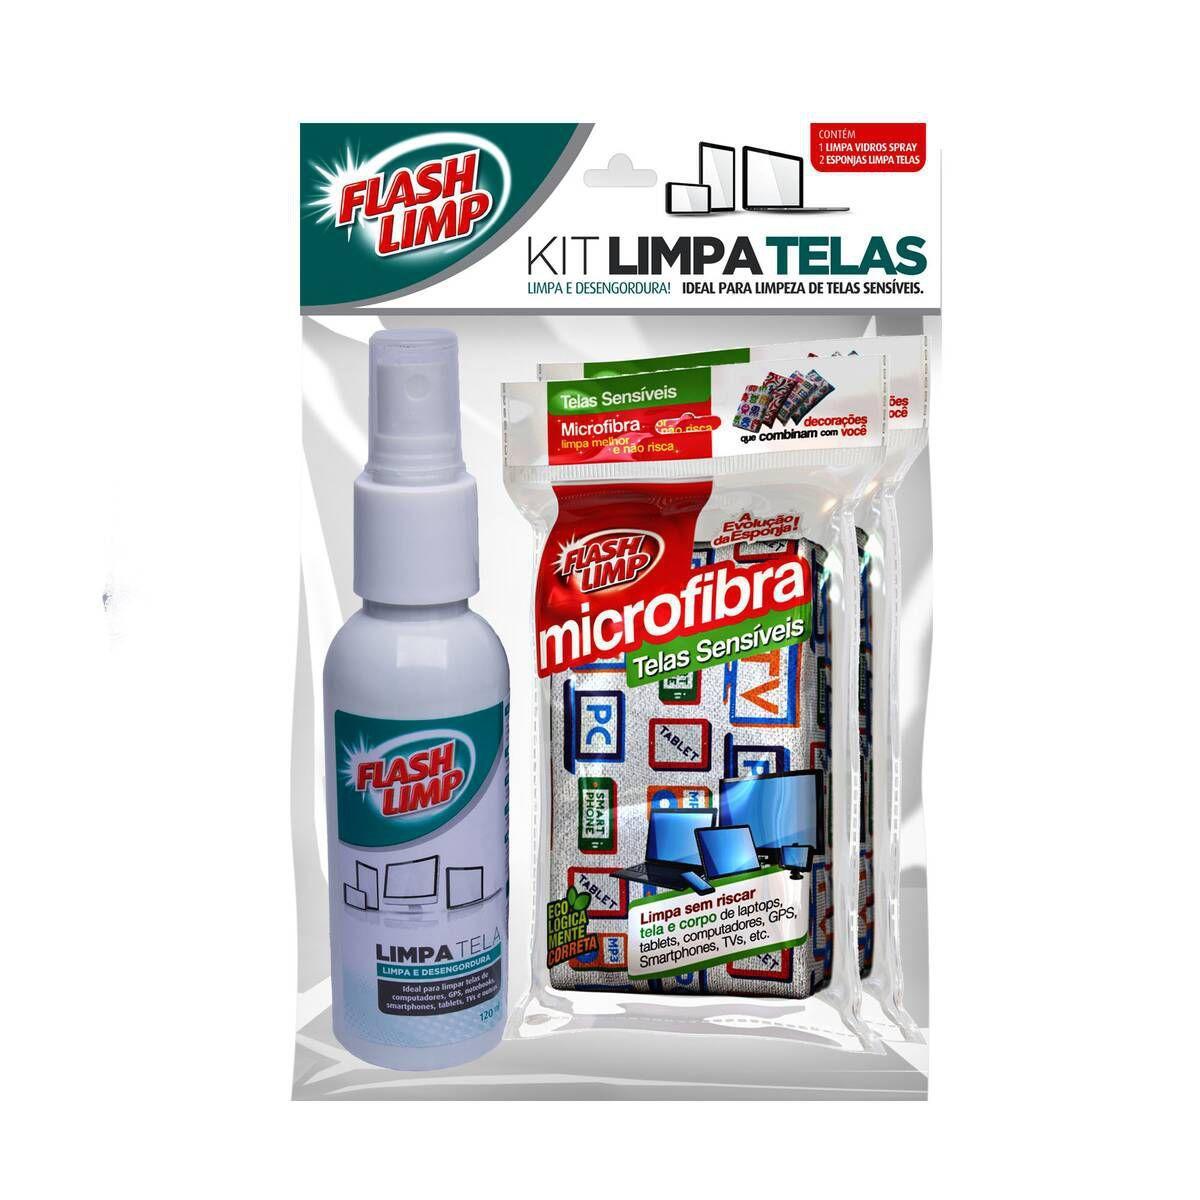 Kit Limpa Telas- FLASH LIMP Limpa e Desengordura